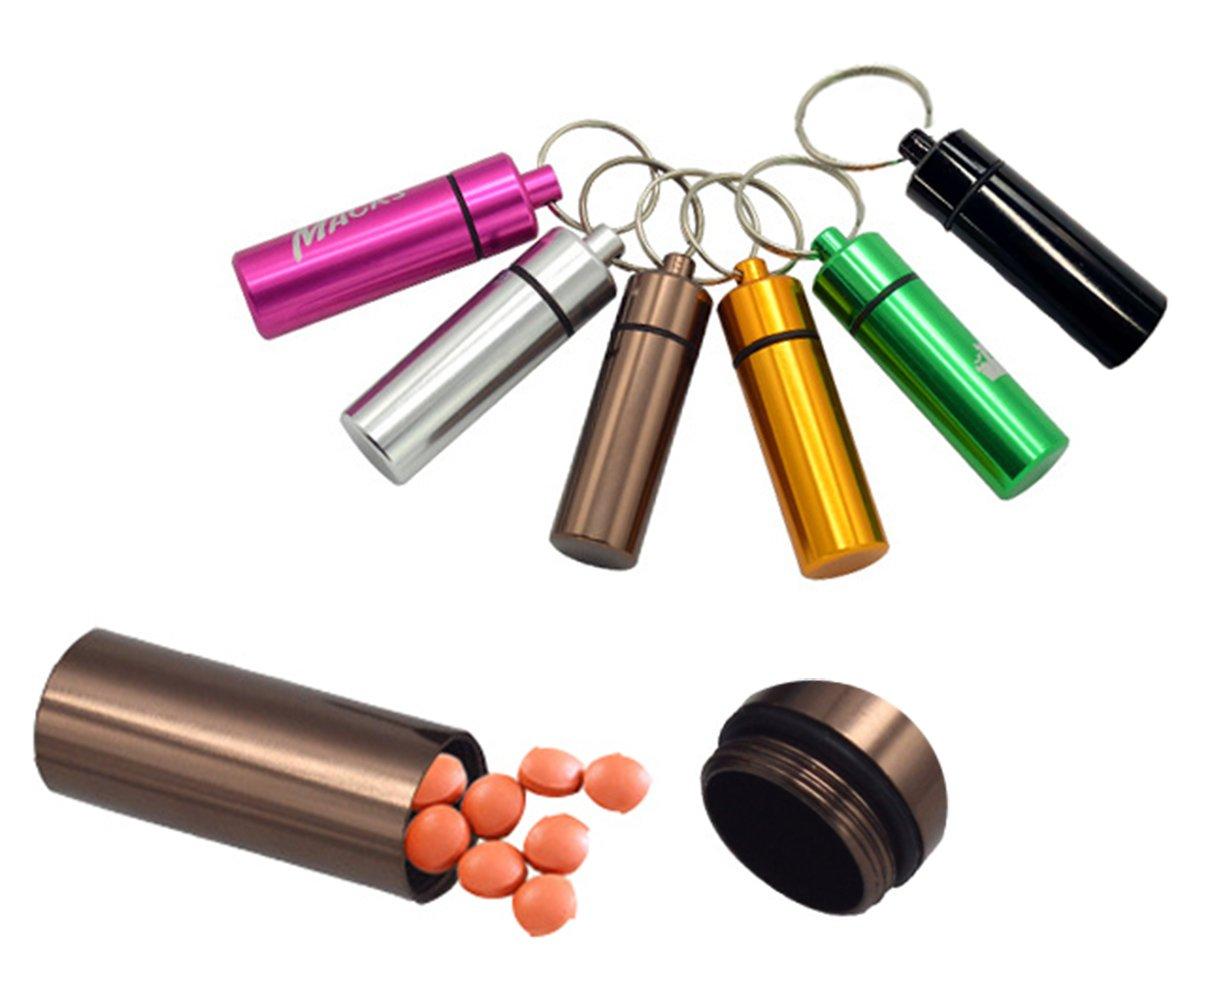 Yunko 6 Pcs Waterproof Aluminum Pill Bottle Organizer Box Case Drug Holder Keychain Container Travel Medicine Storage Color Random by YunKo (Image #1)